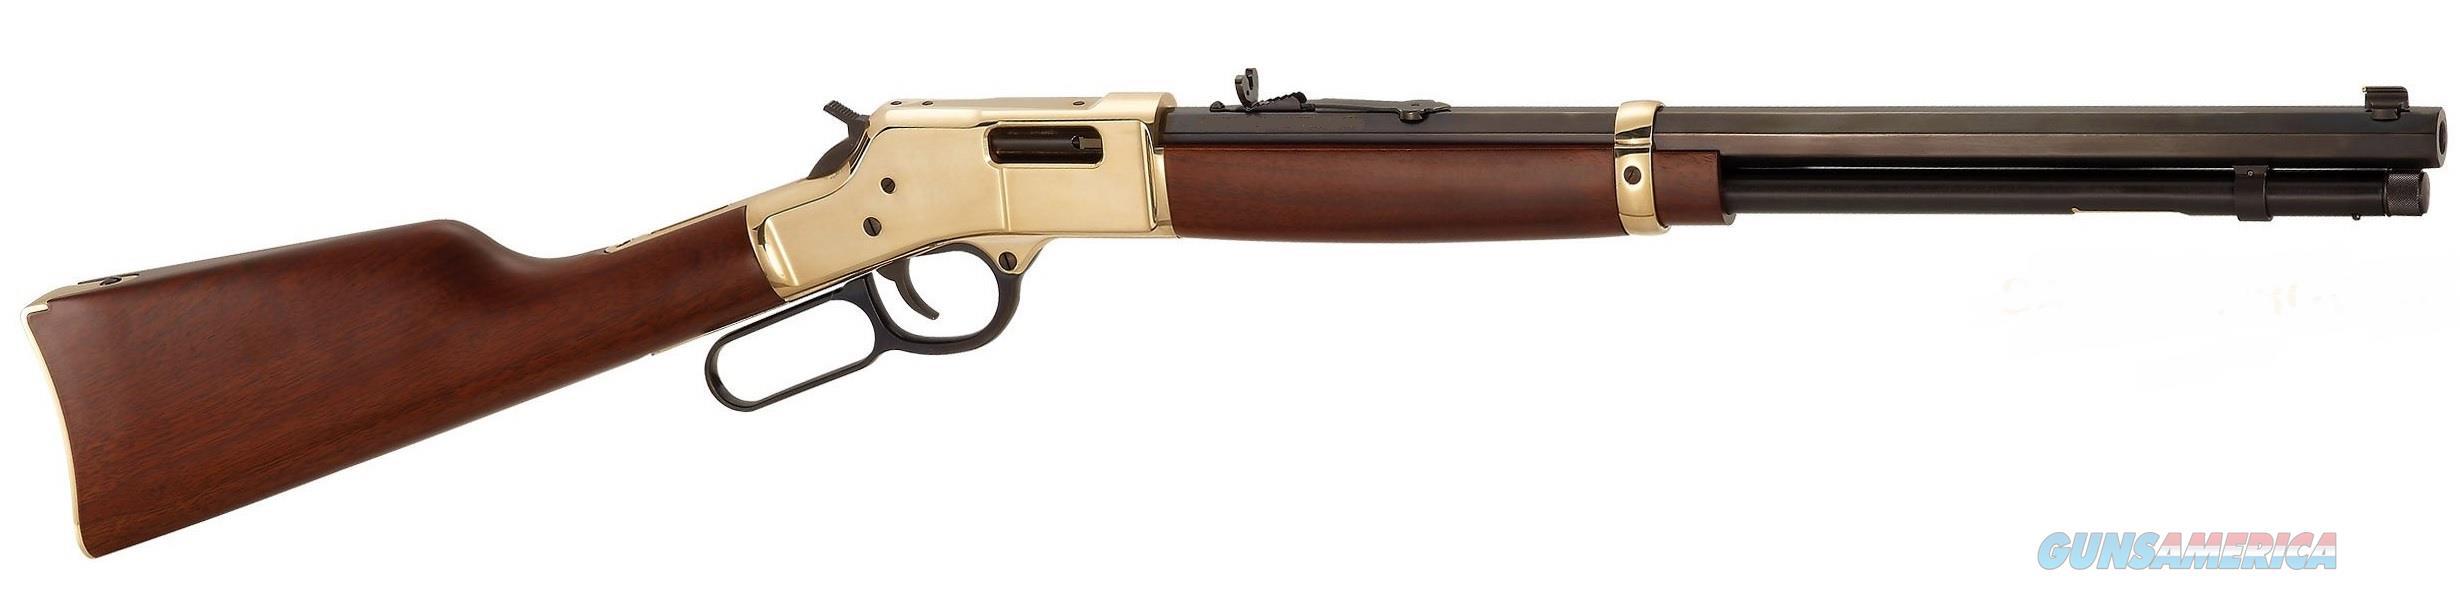 "Henry Big Boy Classic .357 Magnum/.38 Special 20"" H006M  Guns > Rifles > Henry Rifle Company"